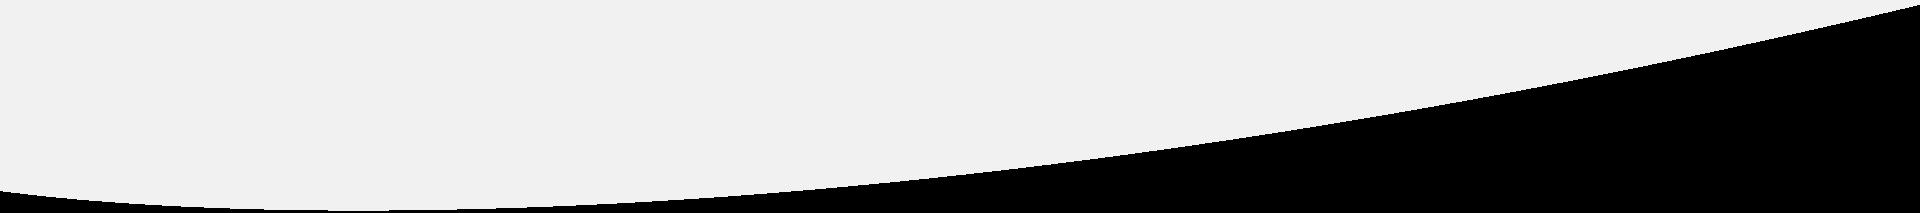 grey-curve-bottom